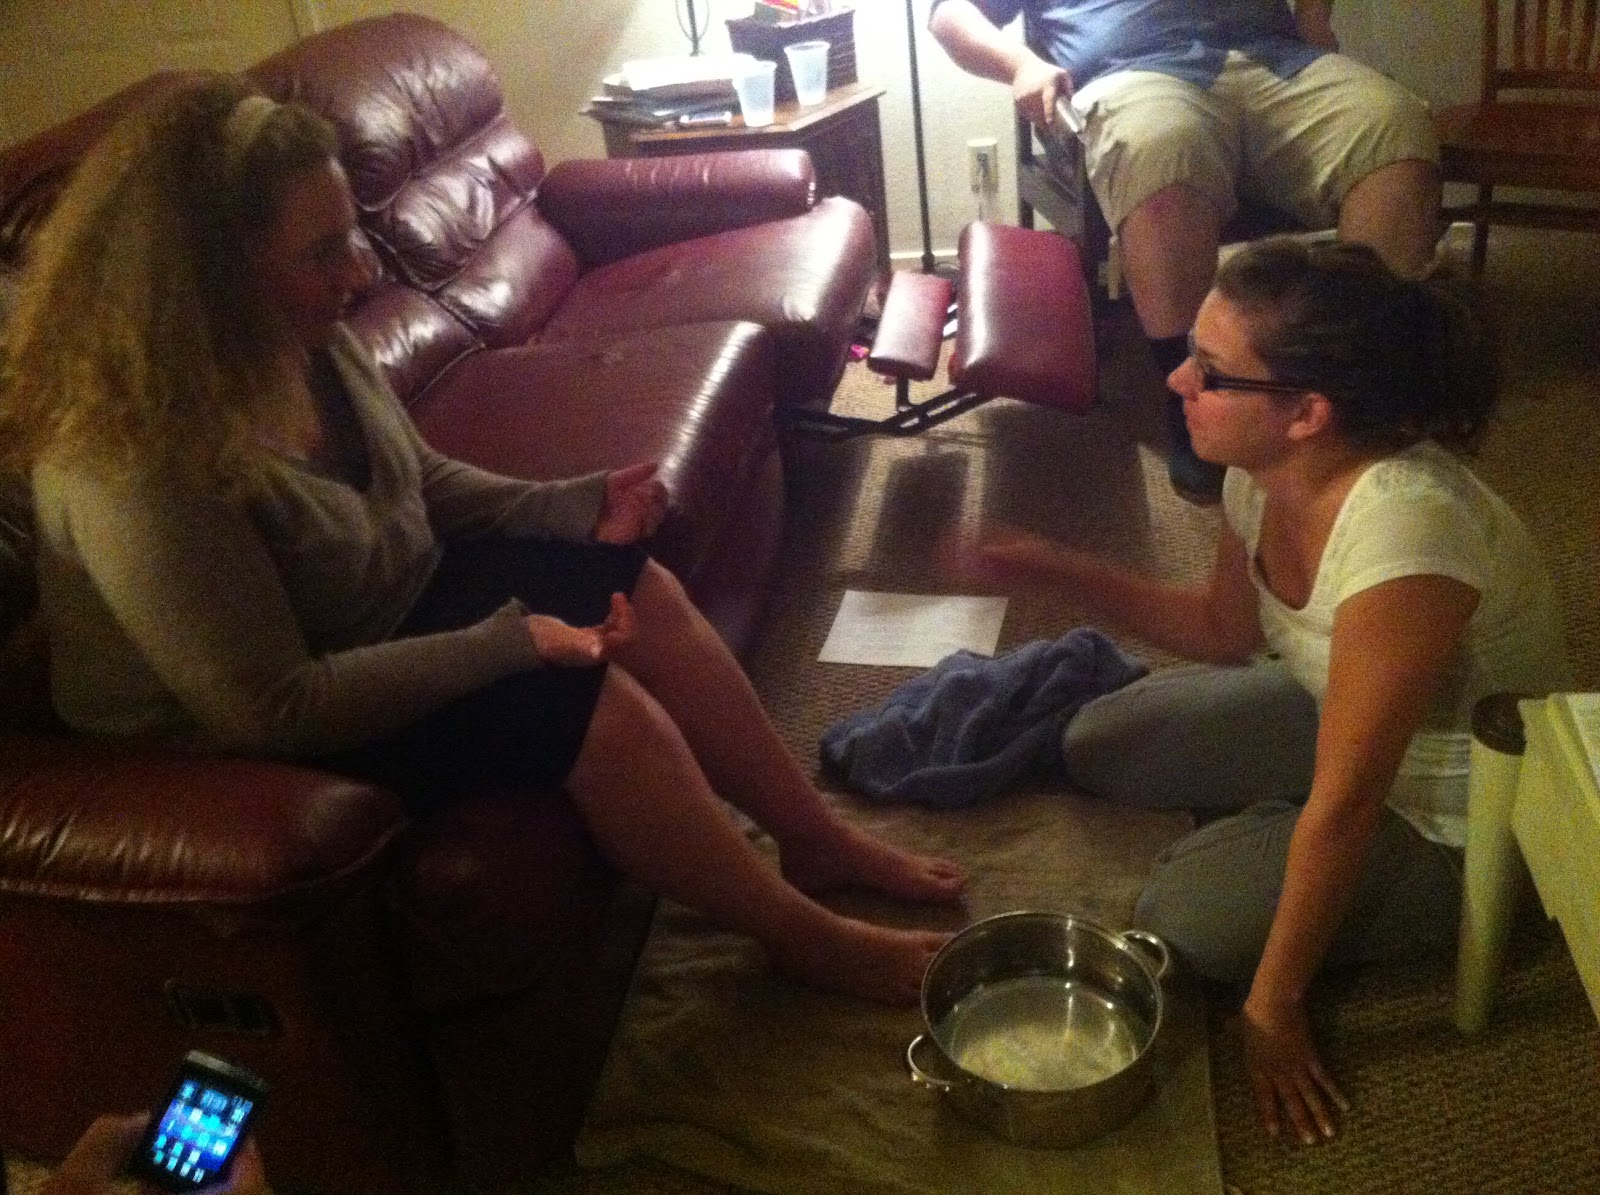 Avril lavigne giving a handjob - 2 part 2